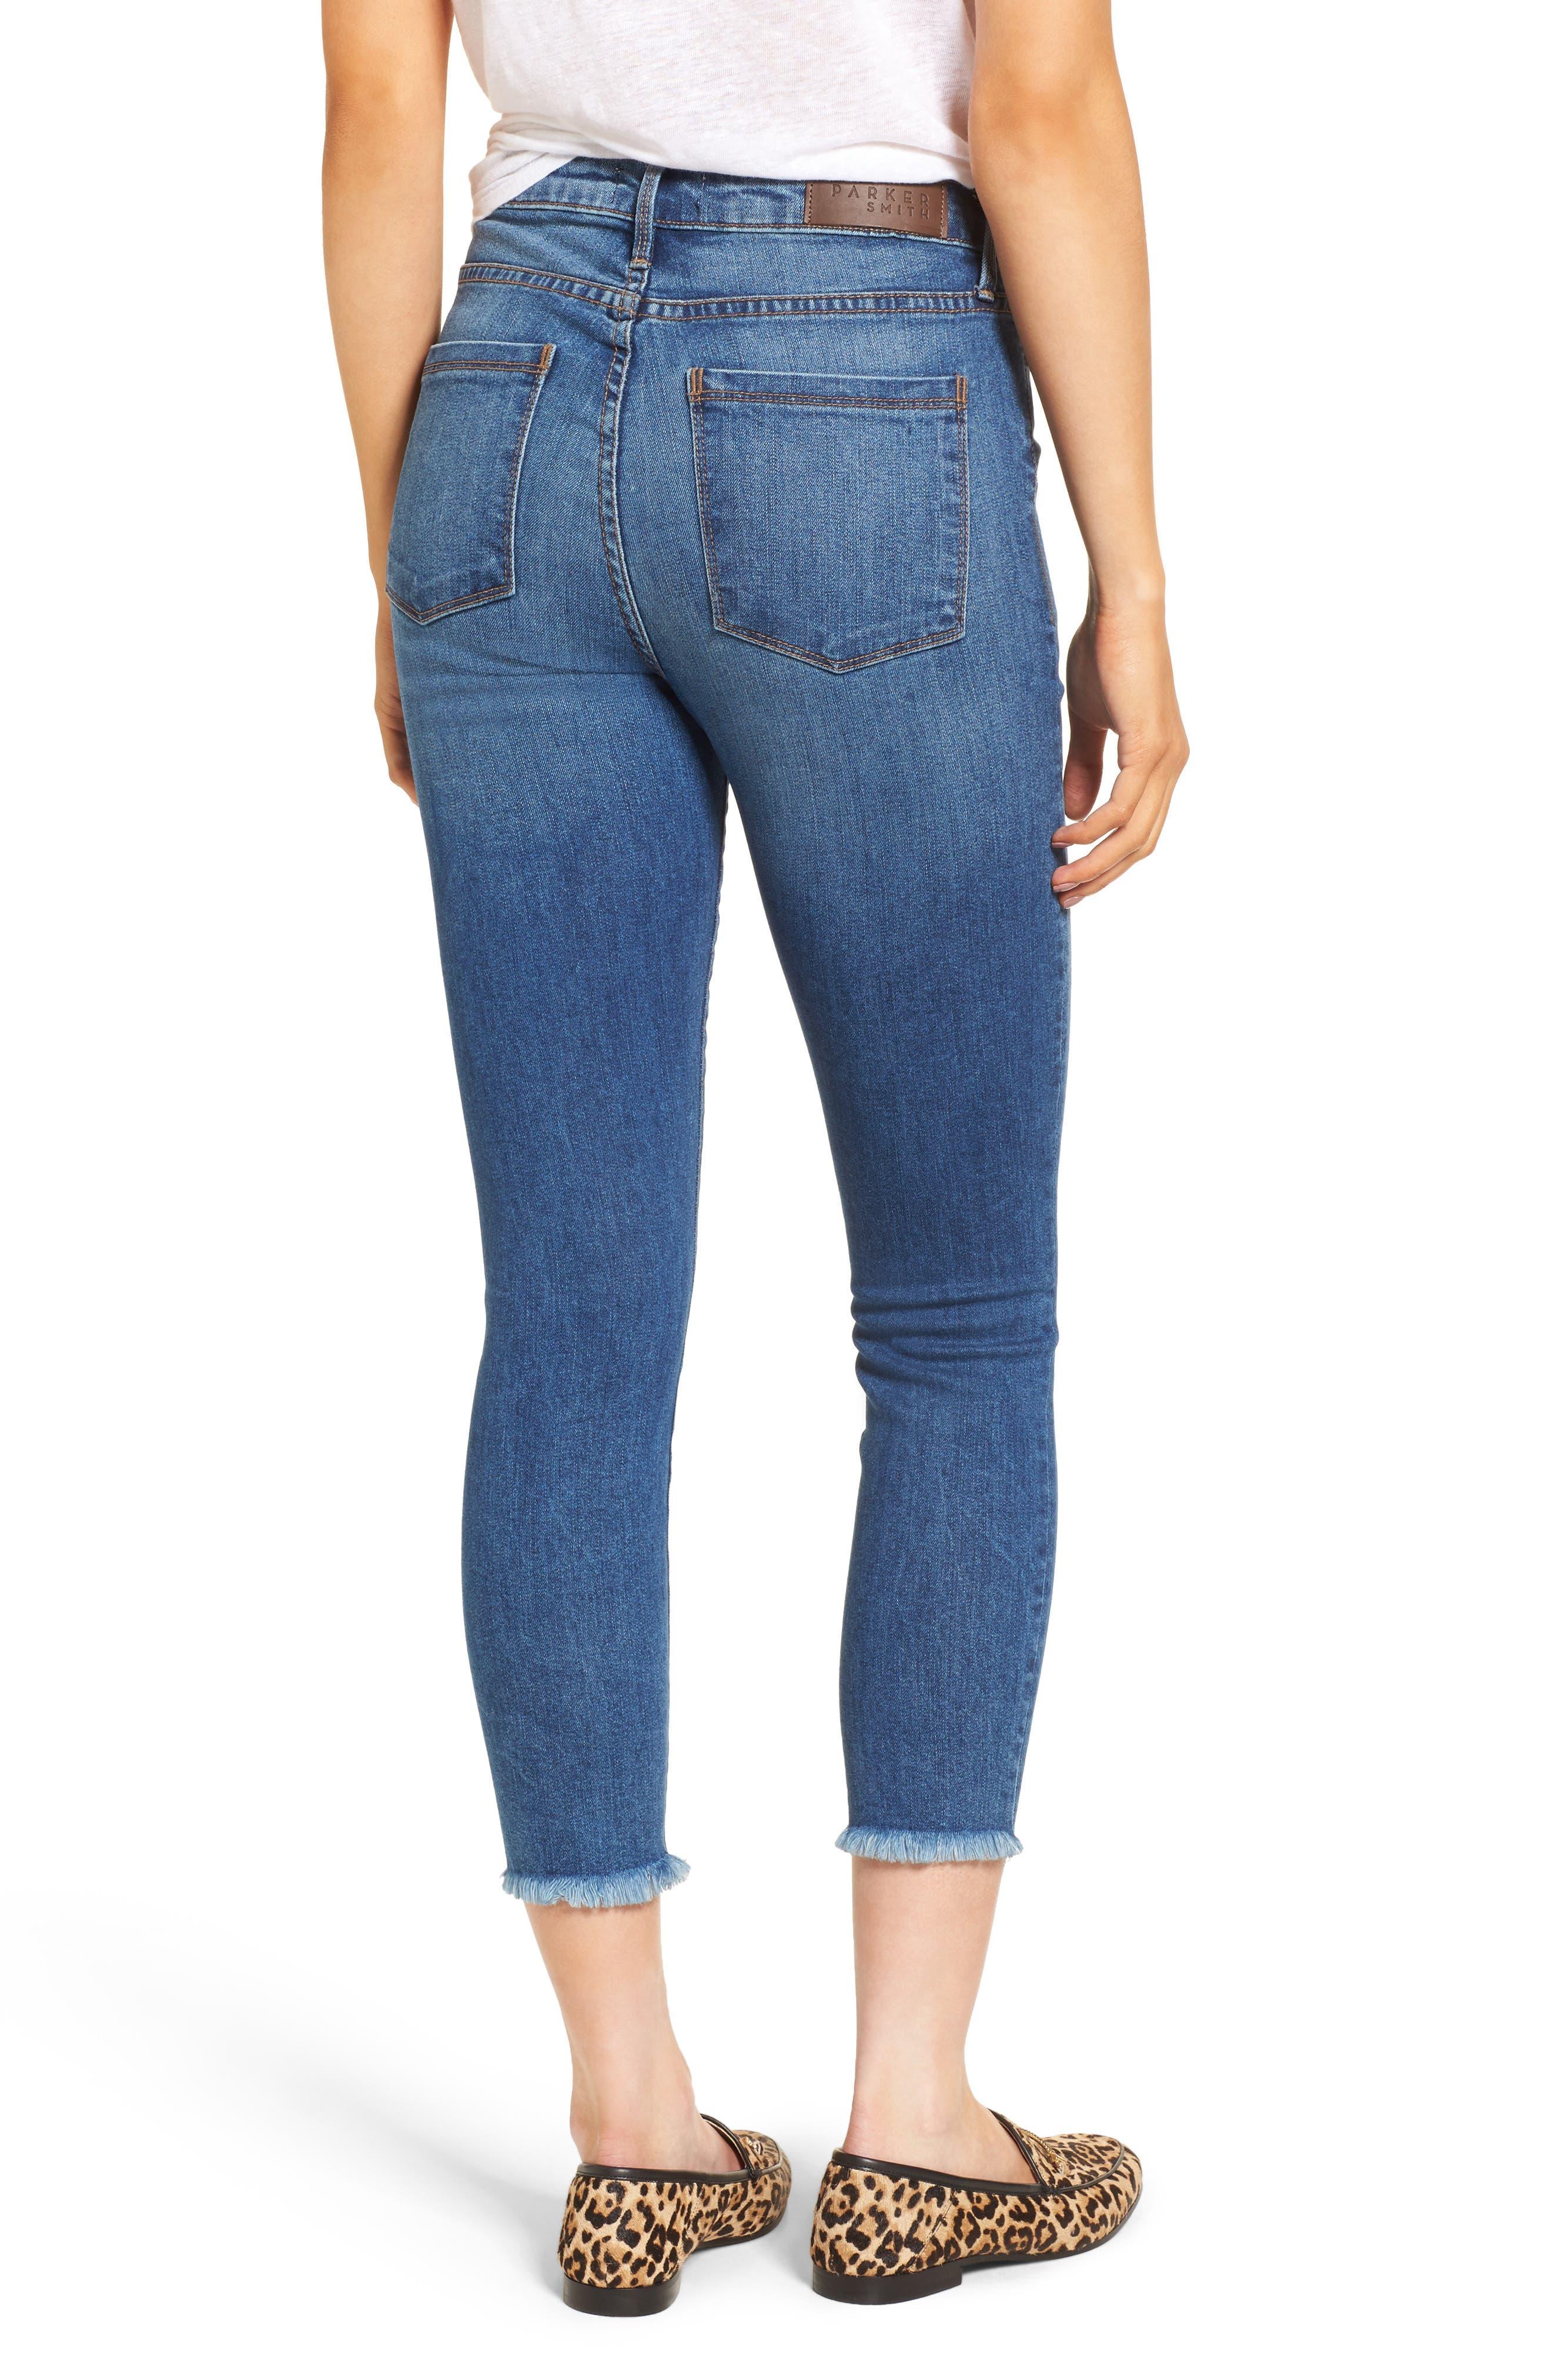 Bombshell Raw Hem Stretch Skinny Jeans,                             Alternate thumbnail 2, color,                             426